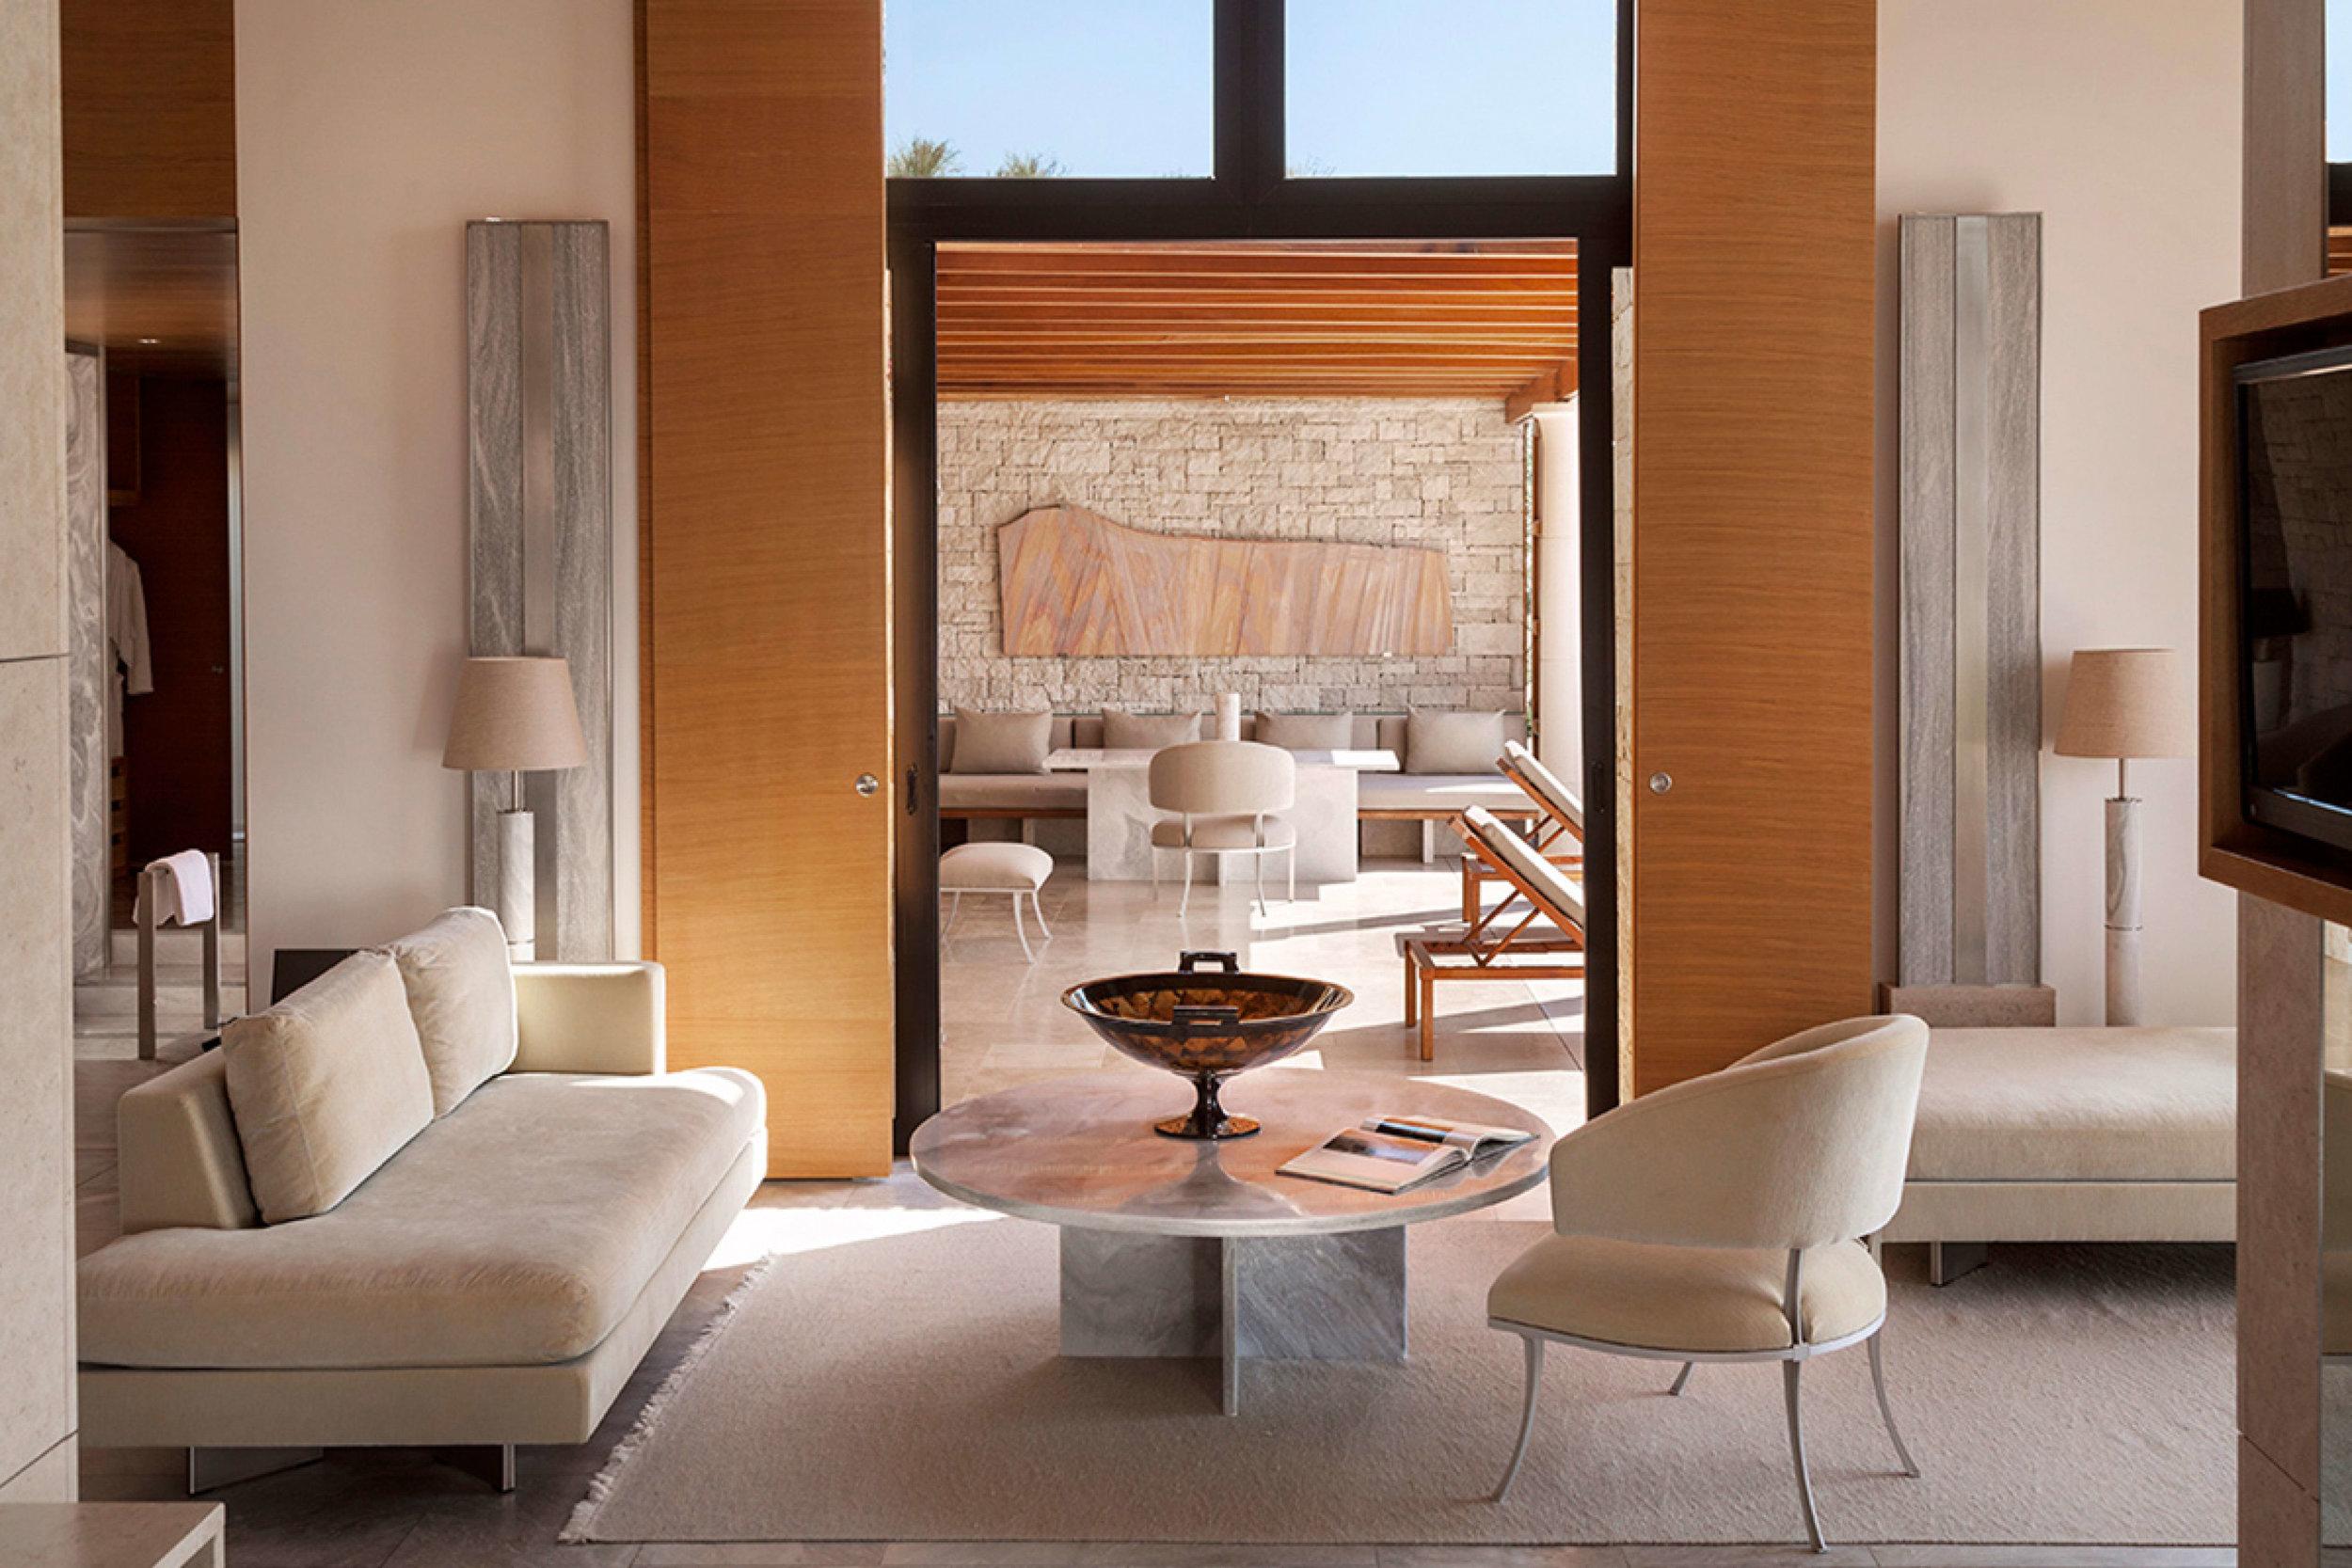 amanzoe-pavilion-living-room-1200x800.jpg